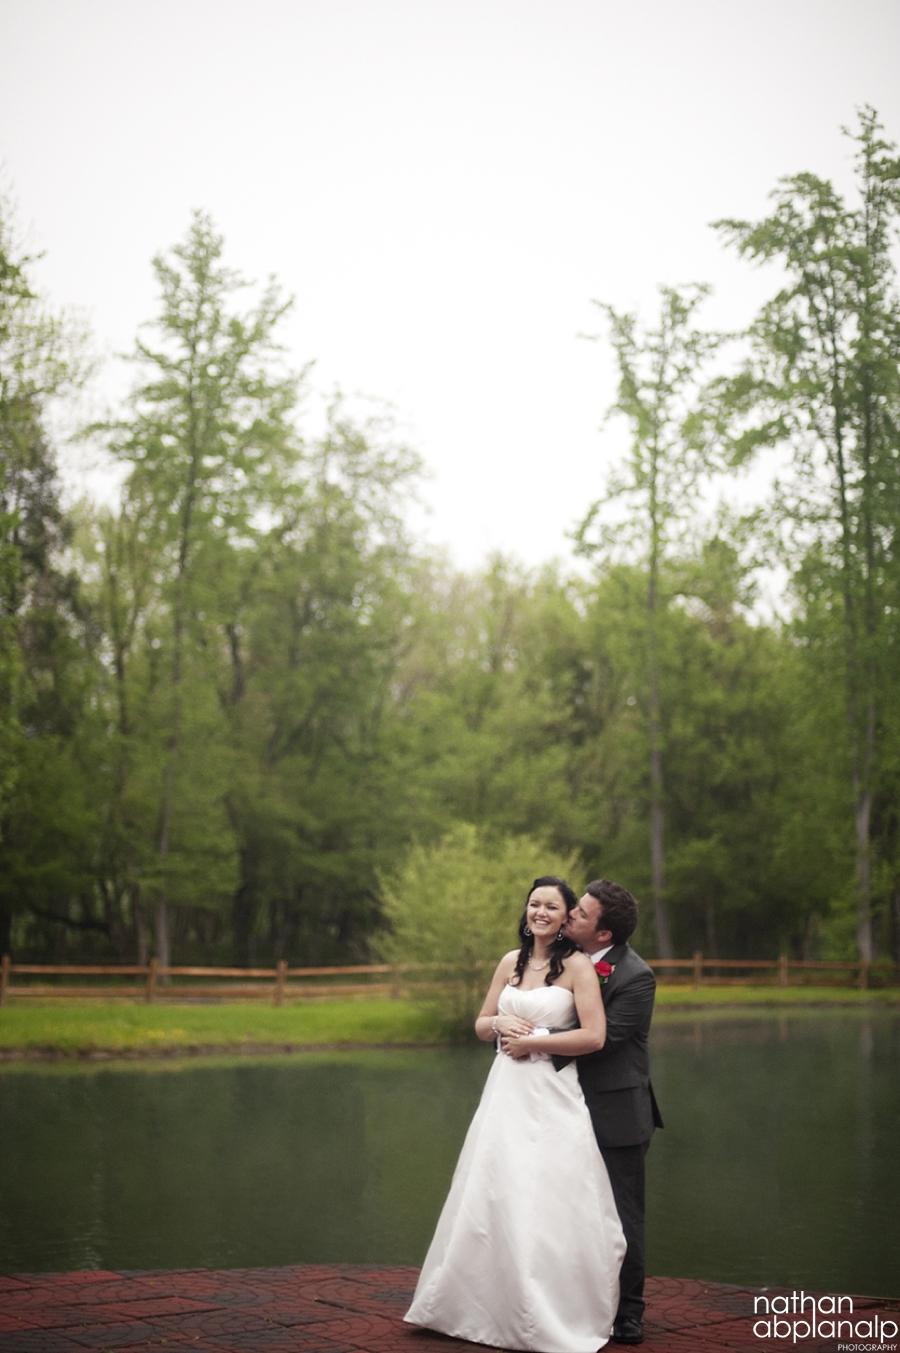 Nathan Abplanalp - Charlotte Wedding Photographer (2)